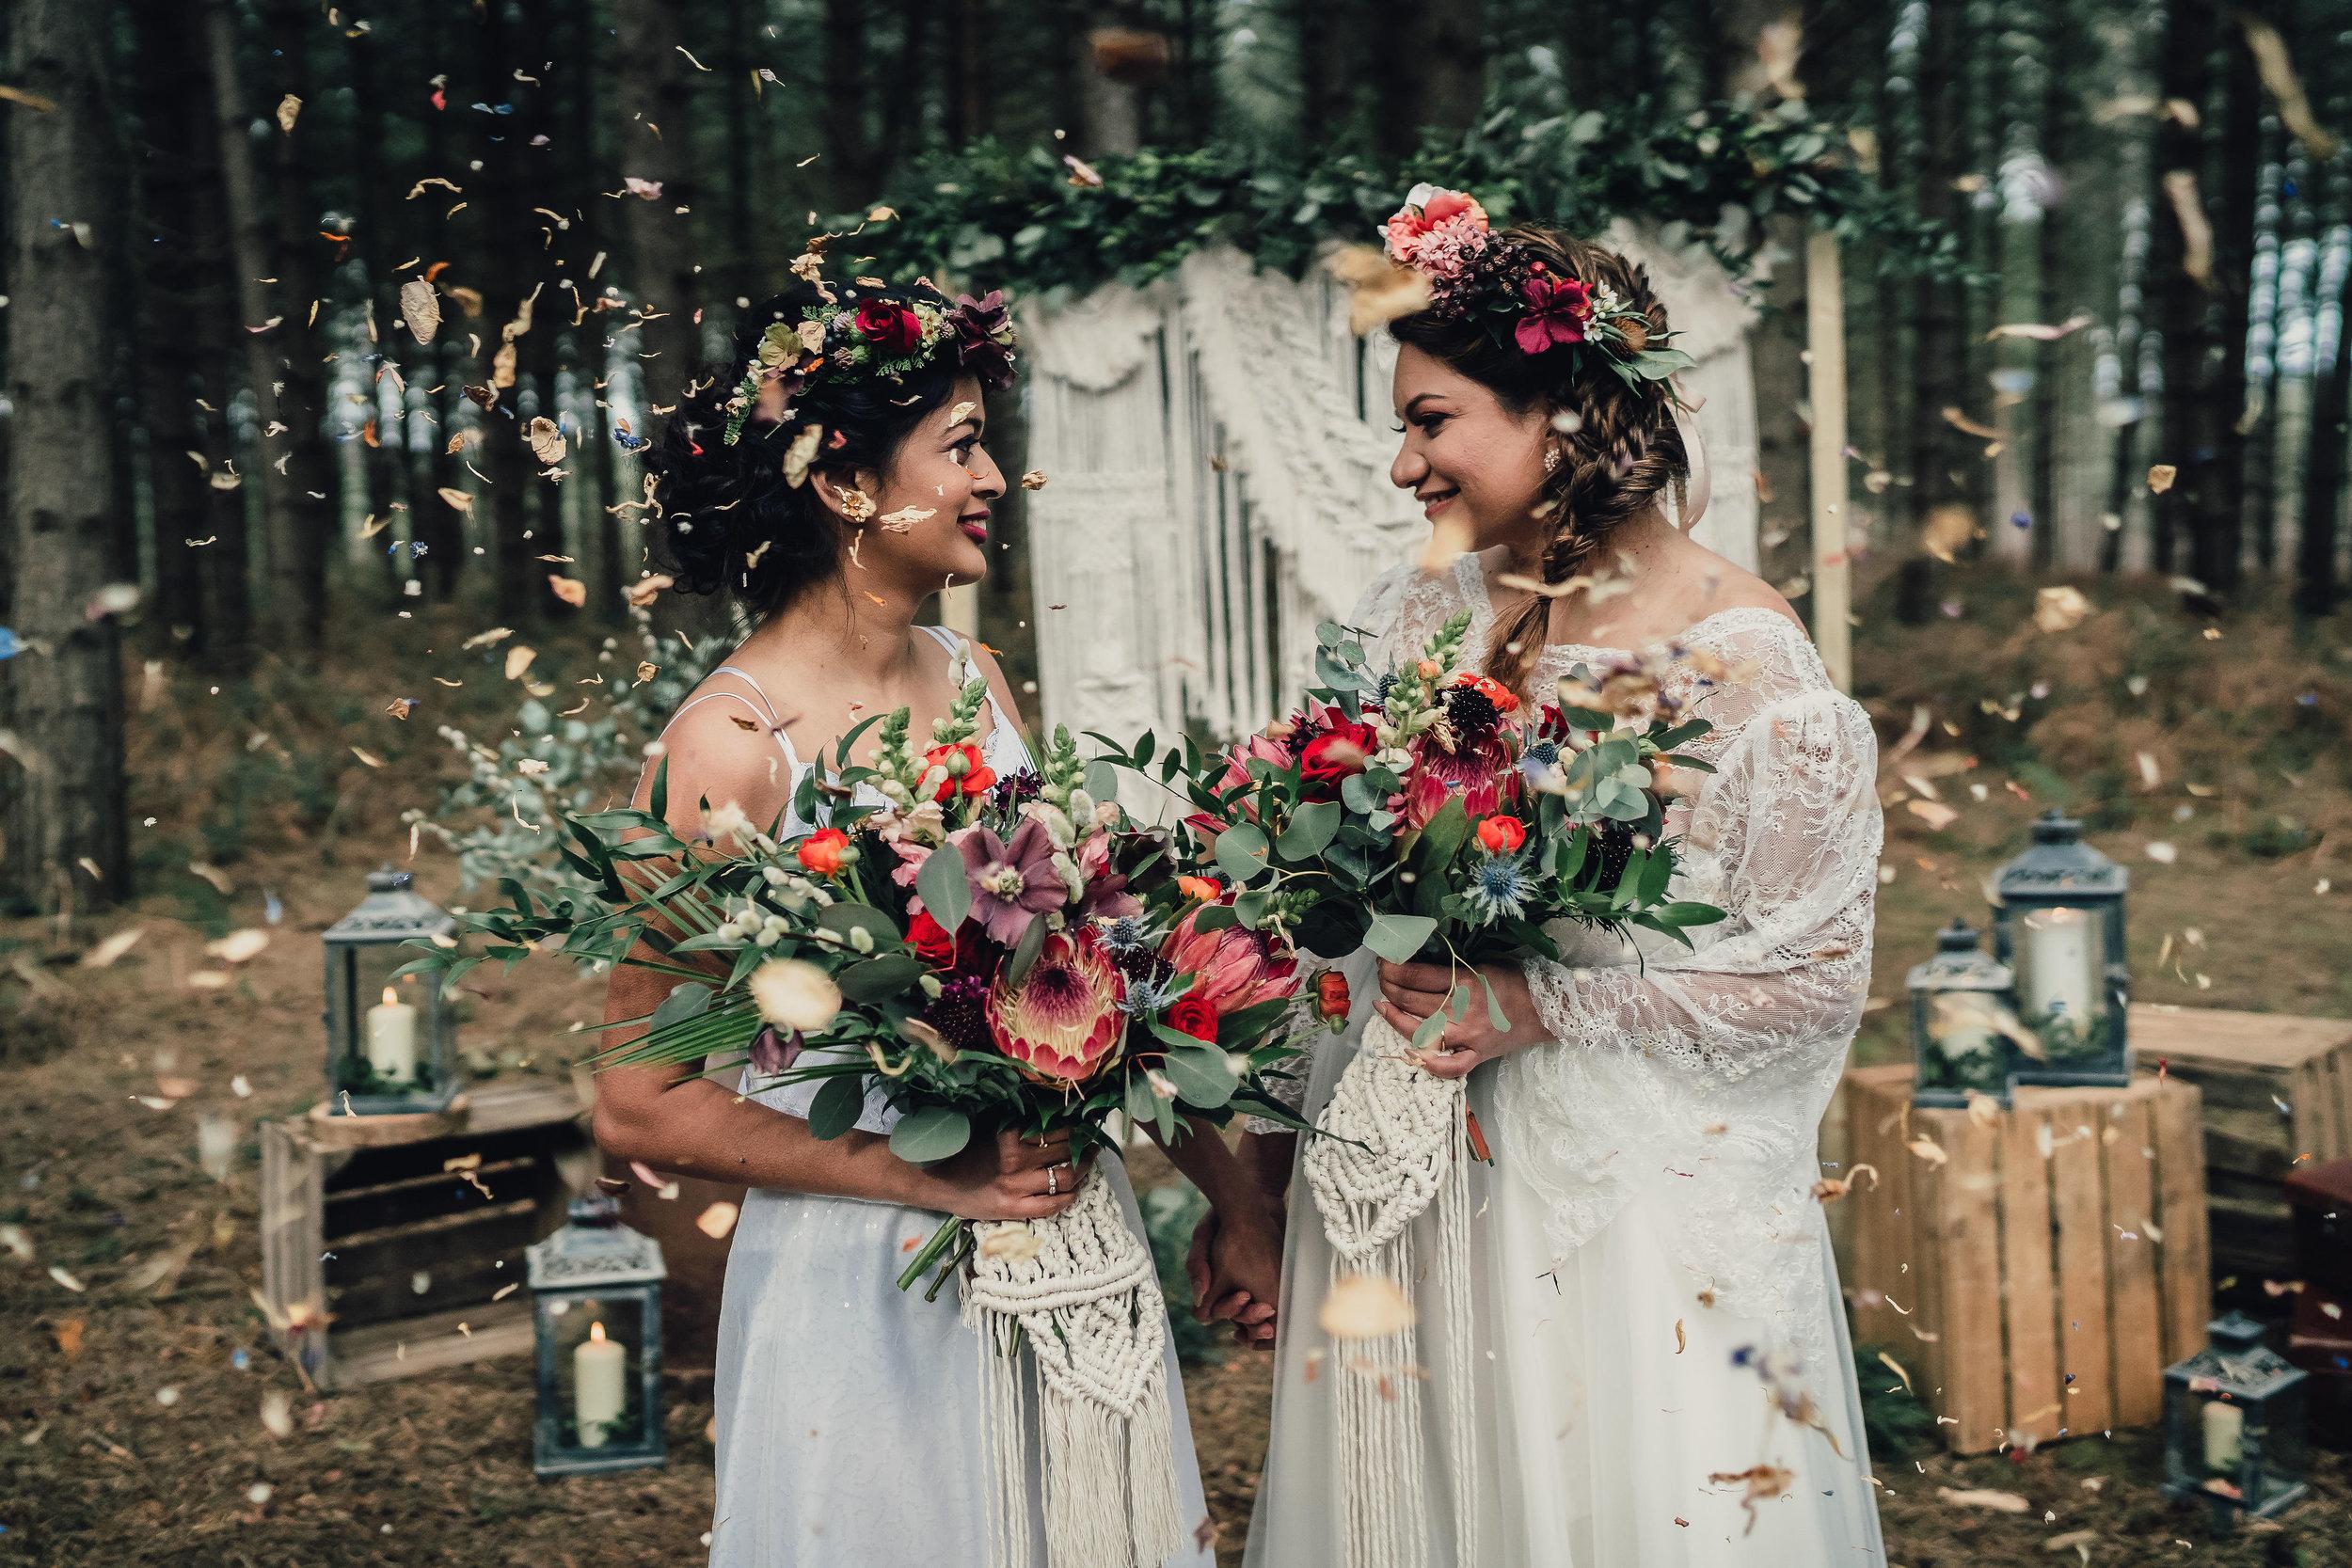 Woodland elopement wedding